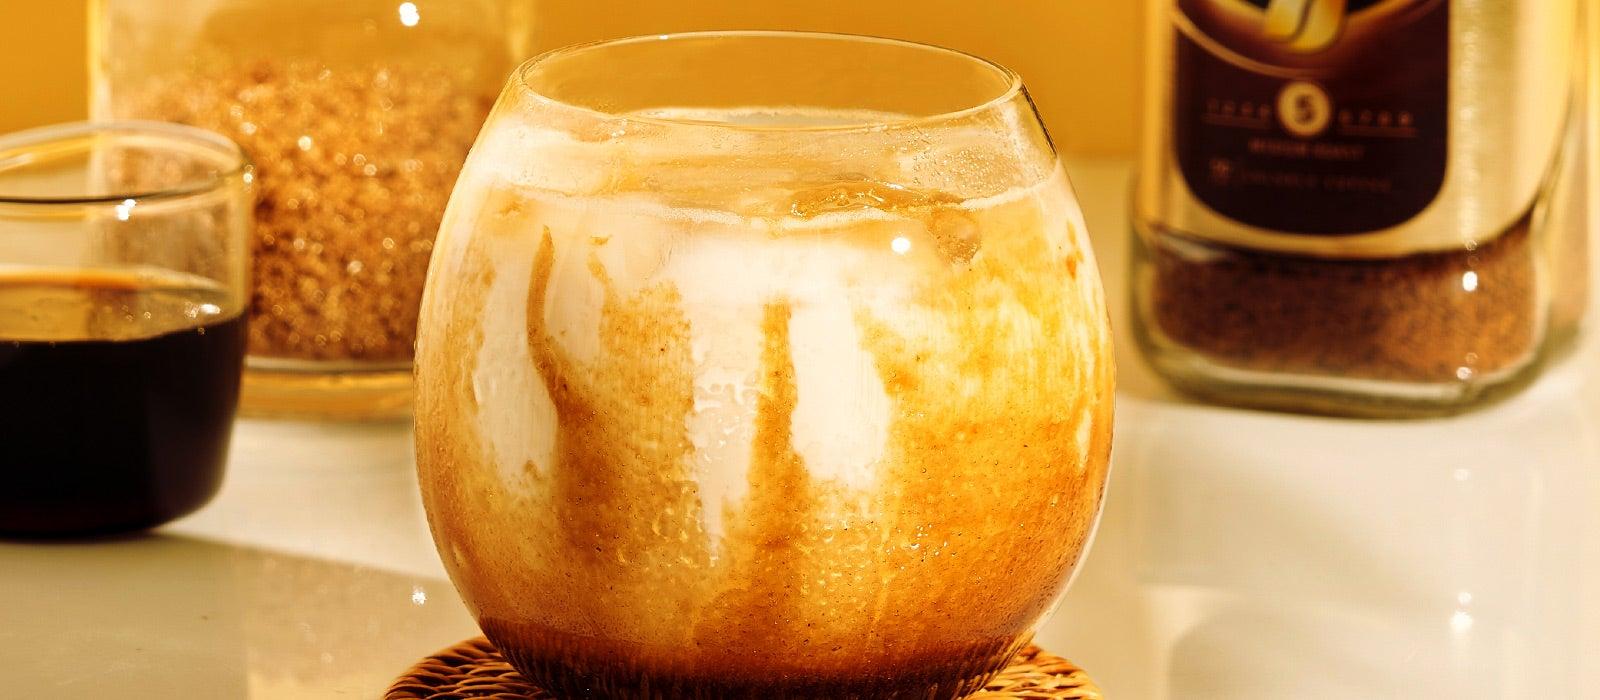 nescafe-gold-iced-brown-sugar-latte-recipe-banner_0.jpg